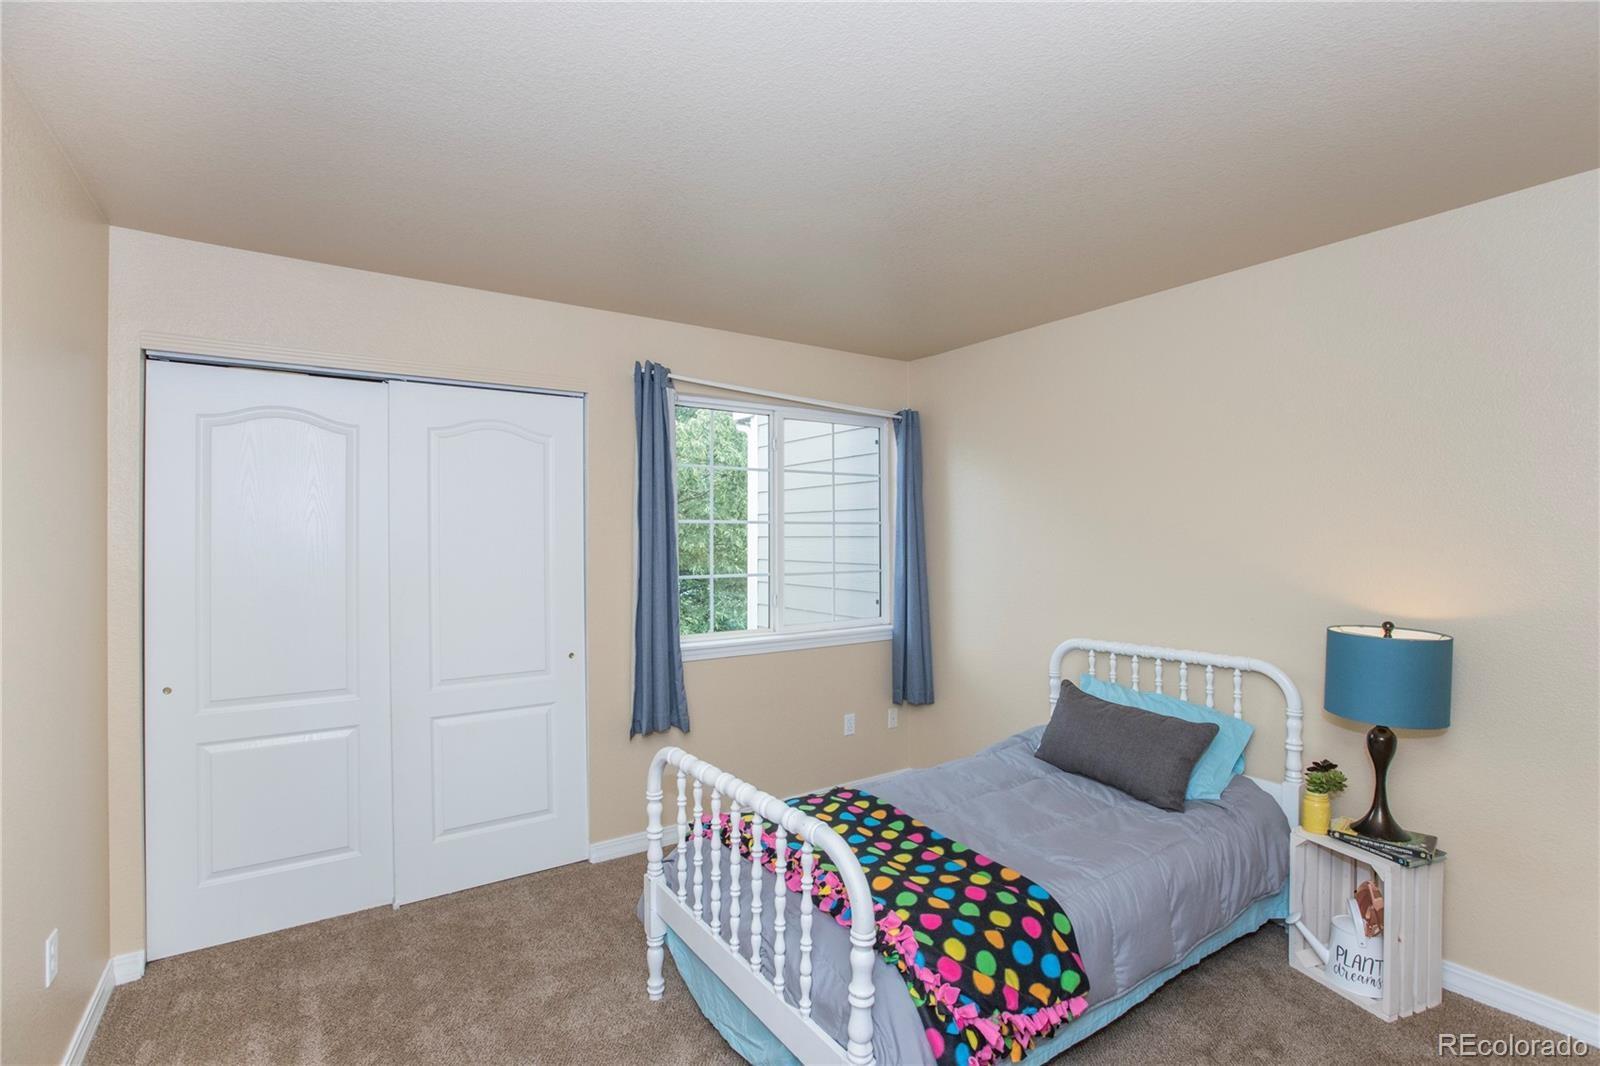 MLS# 3758449 - 22 - 6802 Antigua Drive #26, Fort Collins, CO 80525